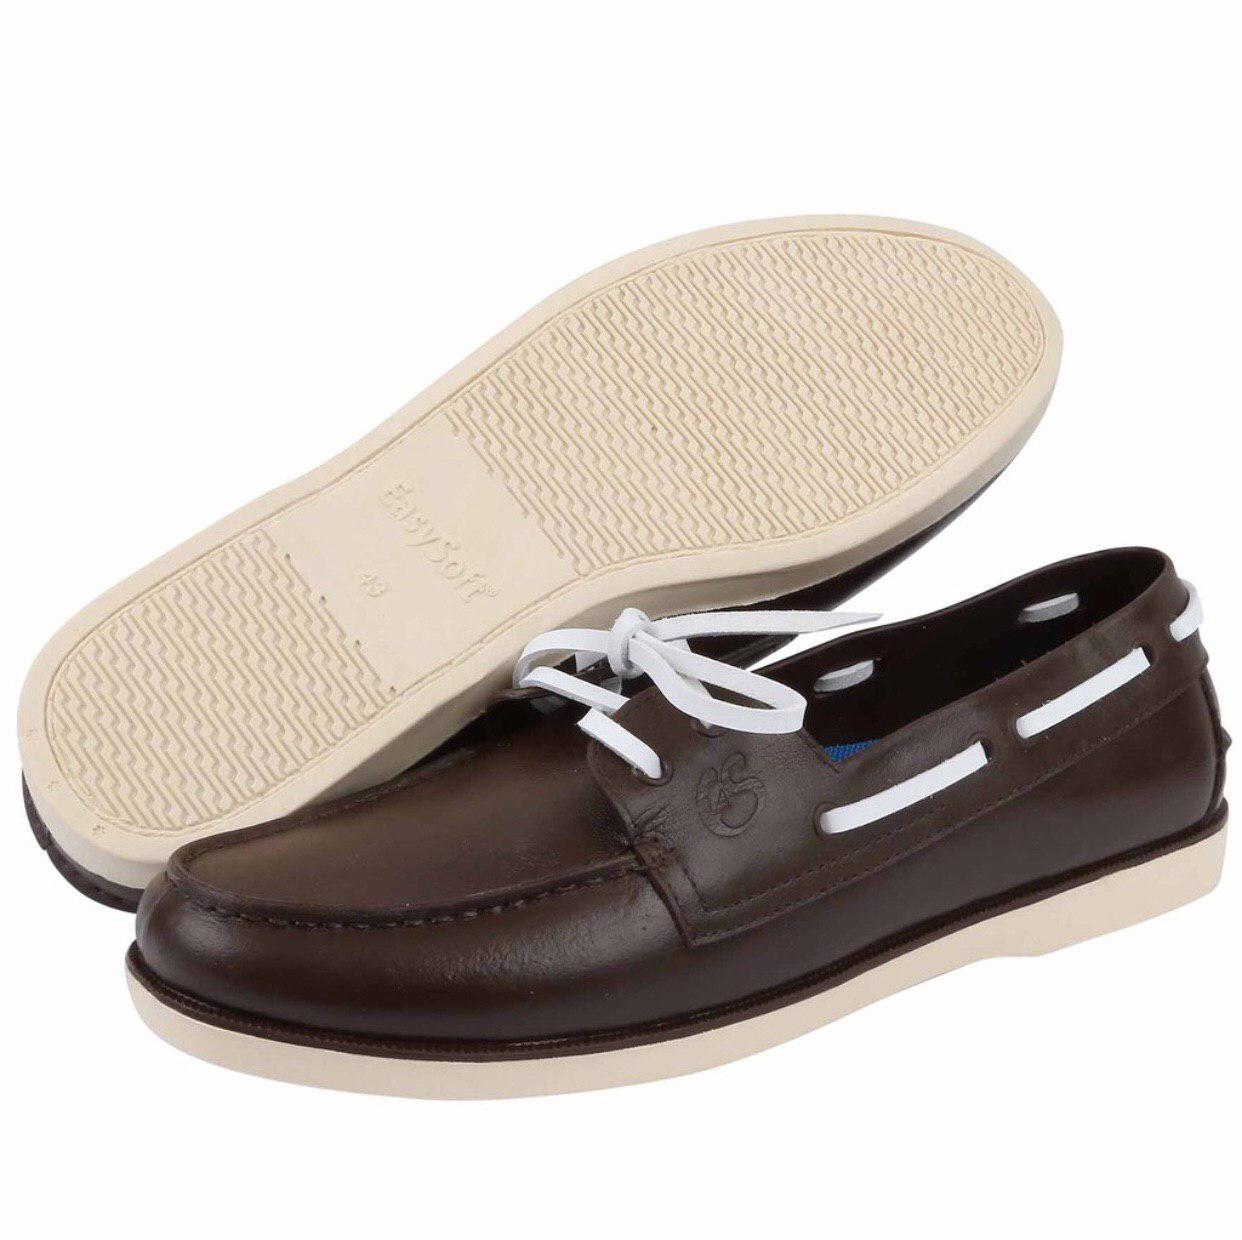 Easy Soft Malibu Dark Brown Shoes for